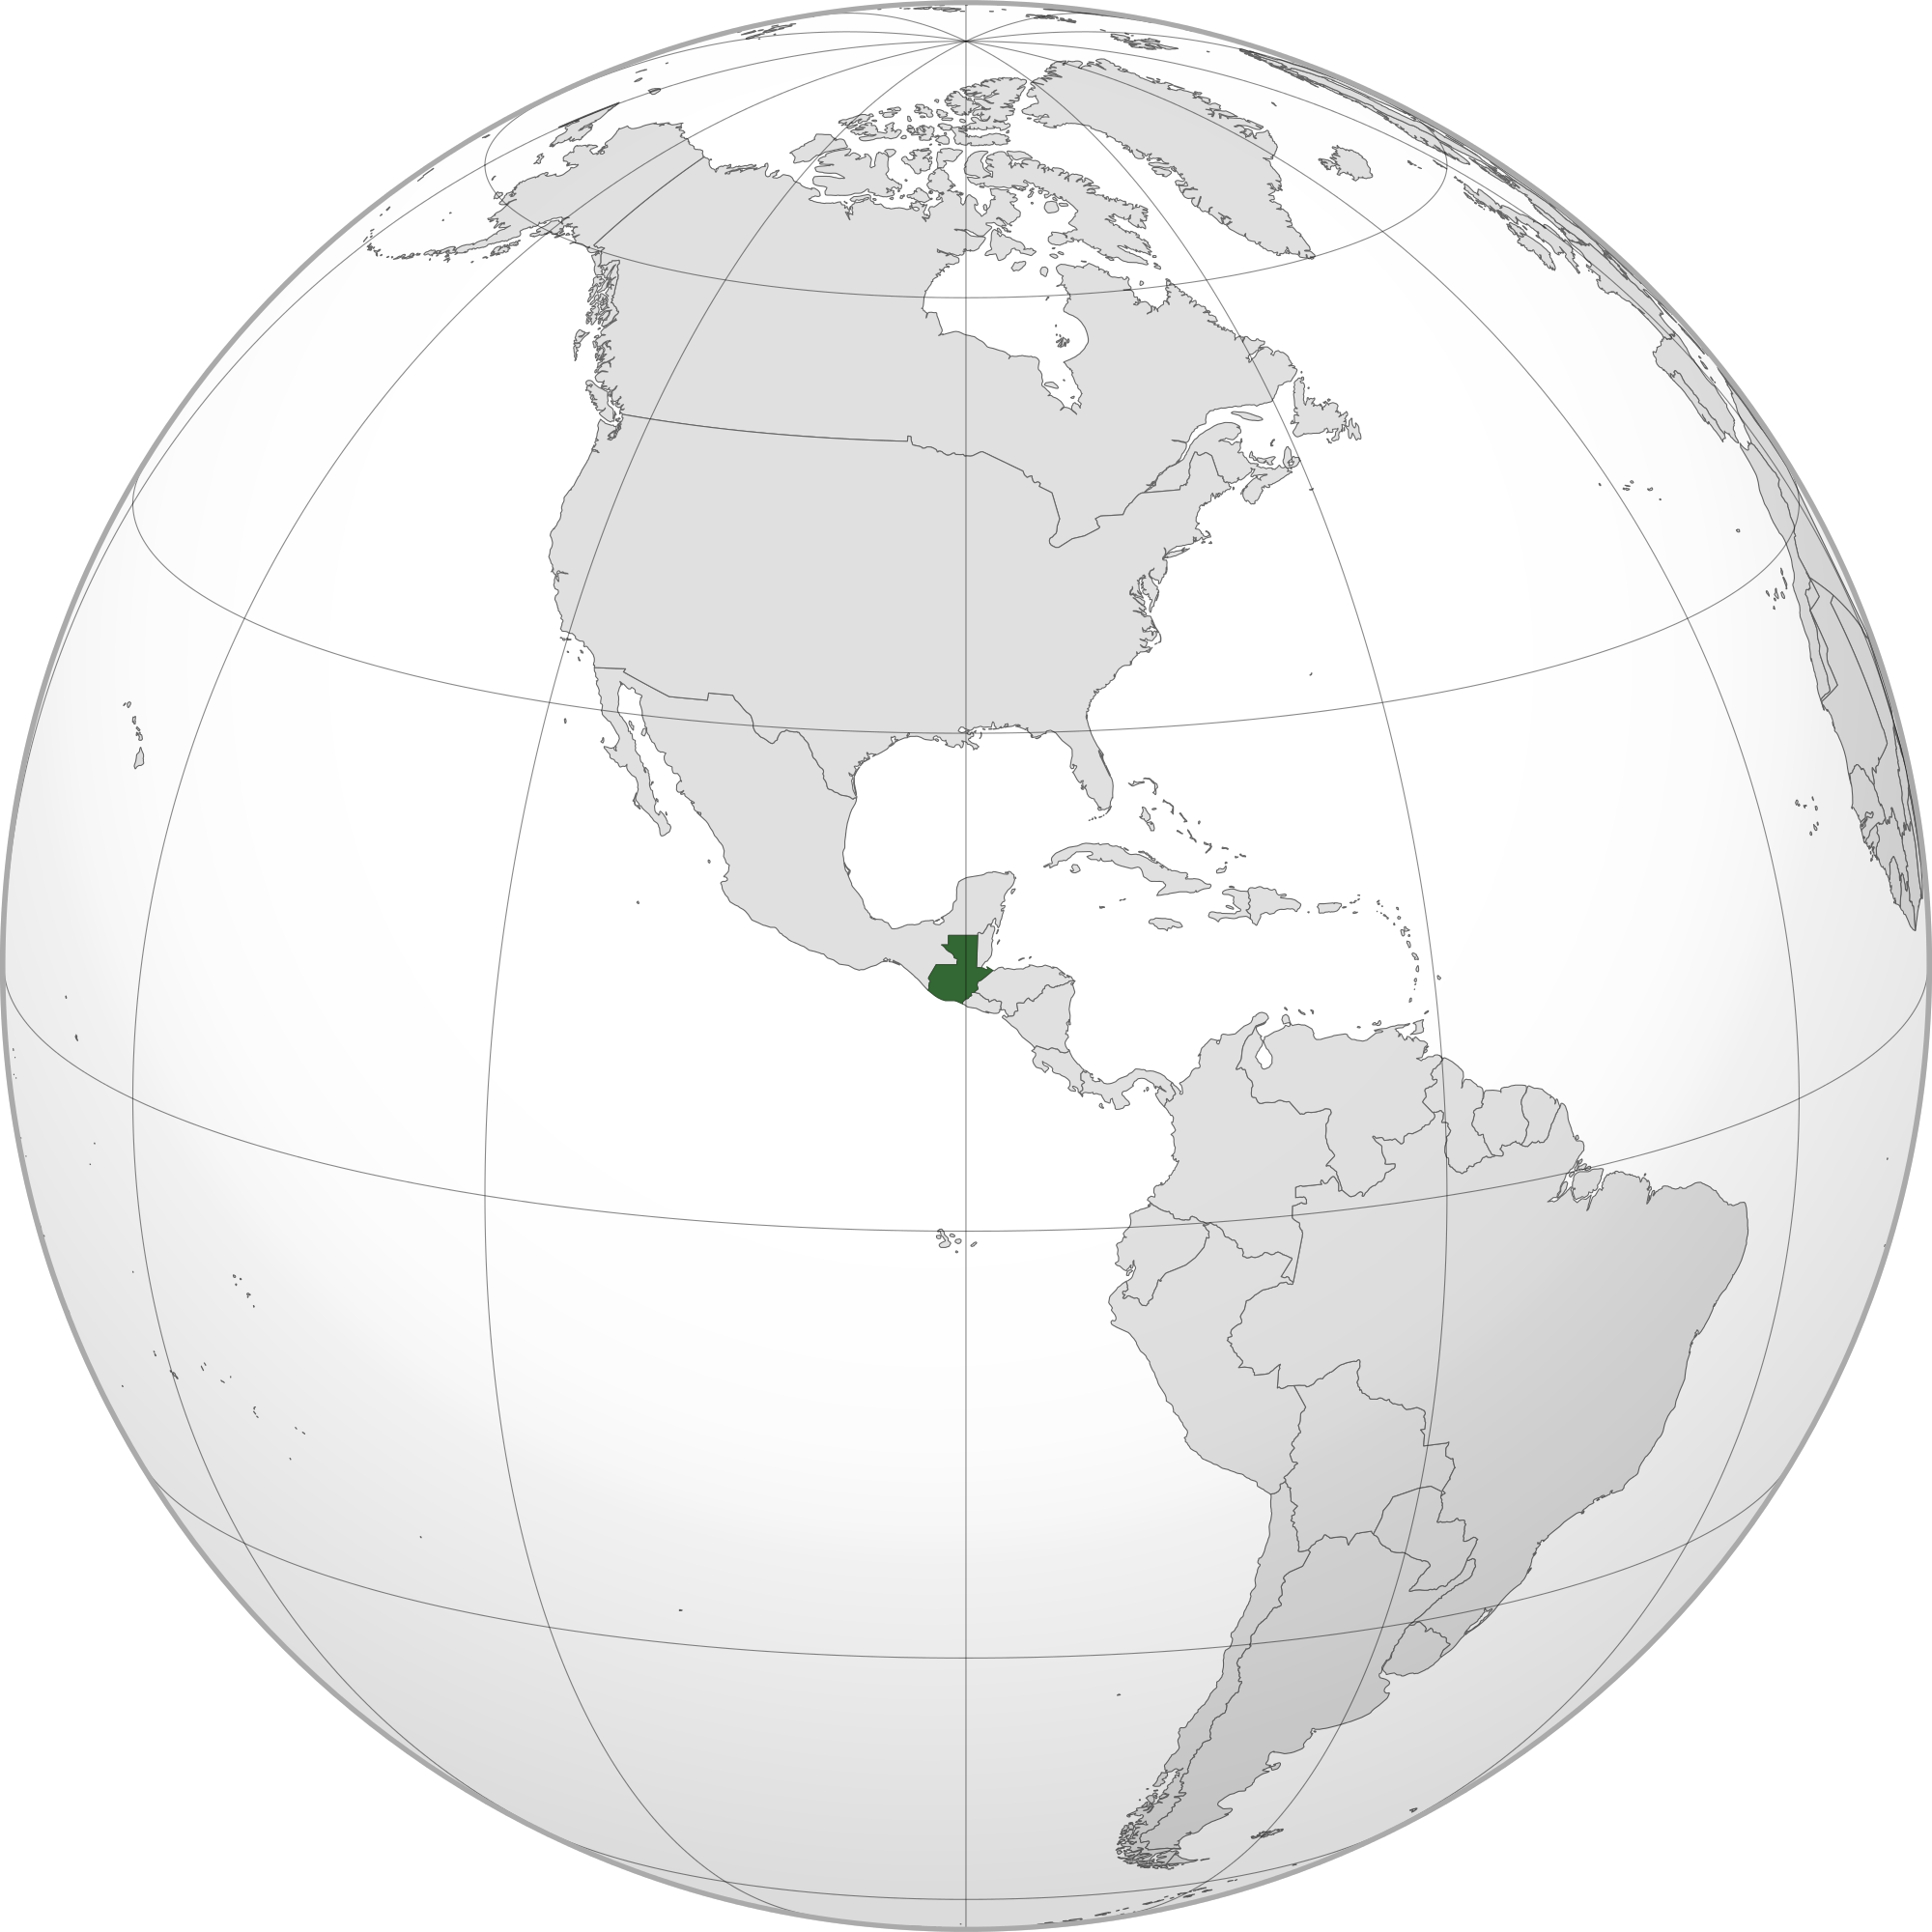 mapa de centroamerica mapa fisico de america para colorear mapa de centroamerica